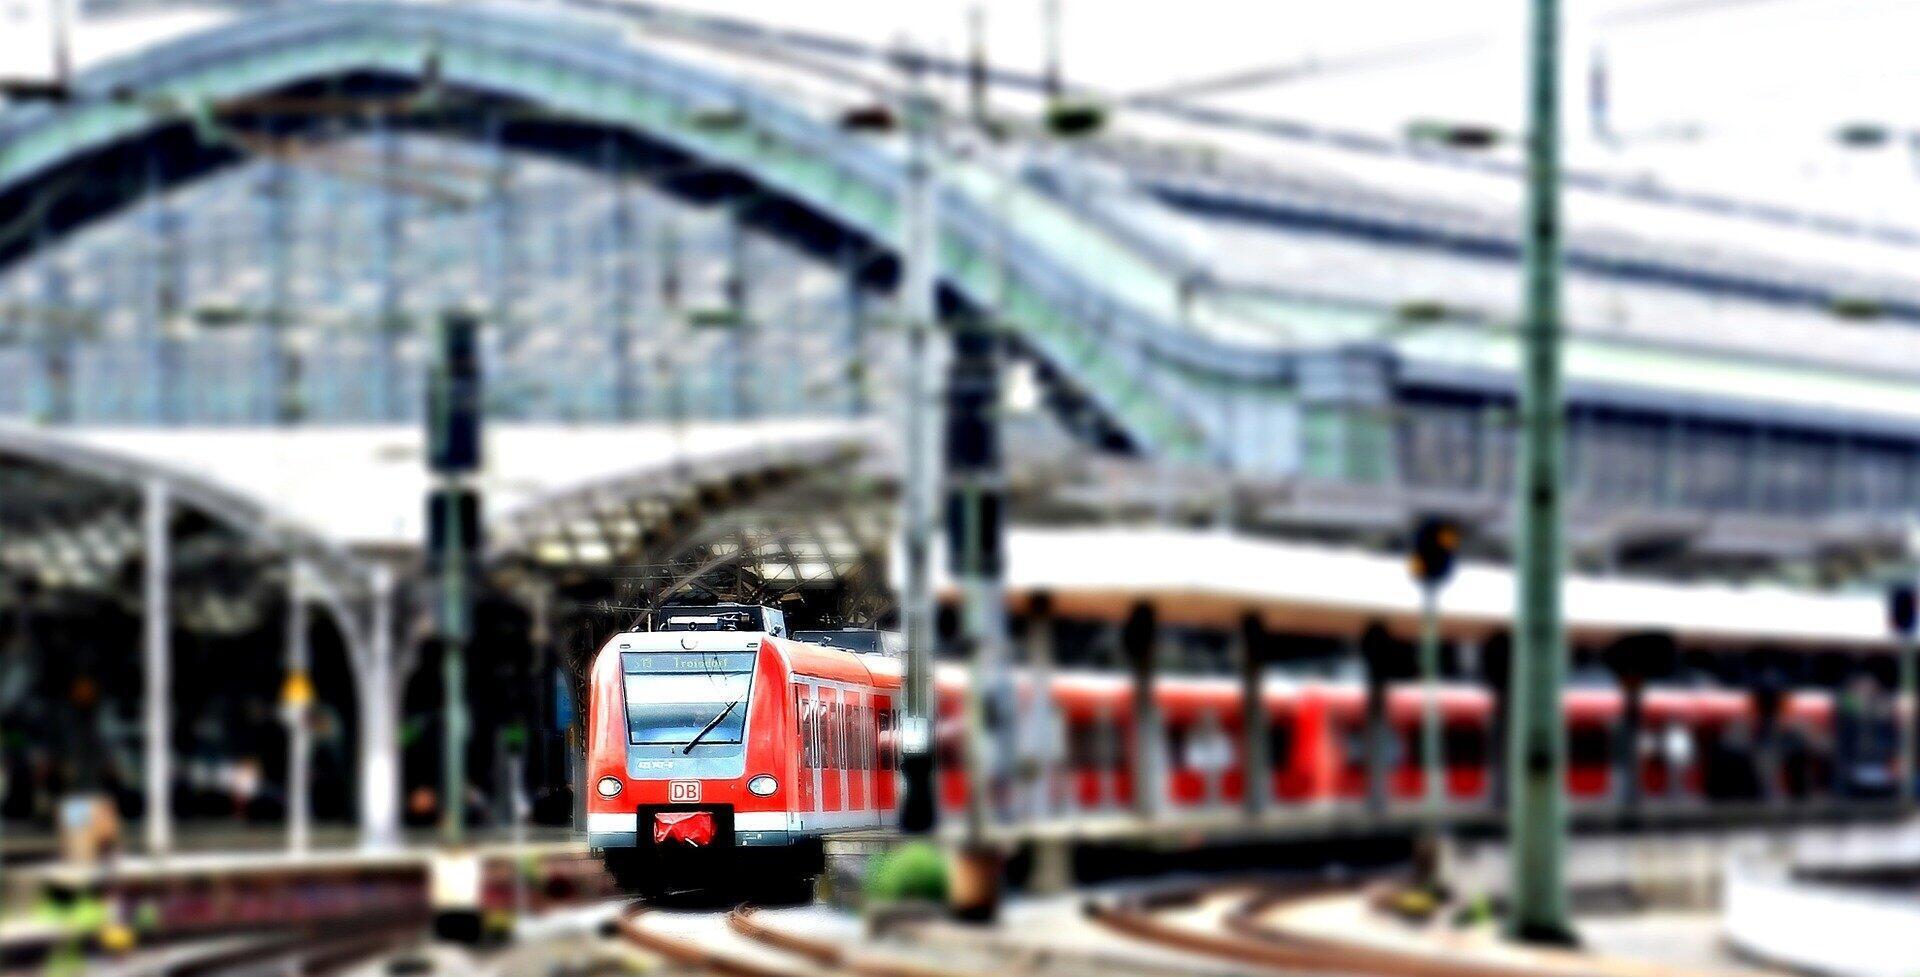 central-station-1527780_1920